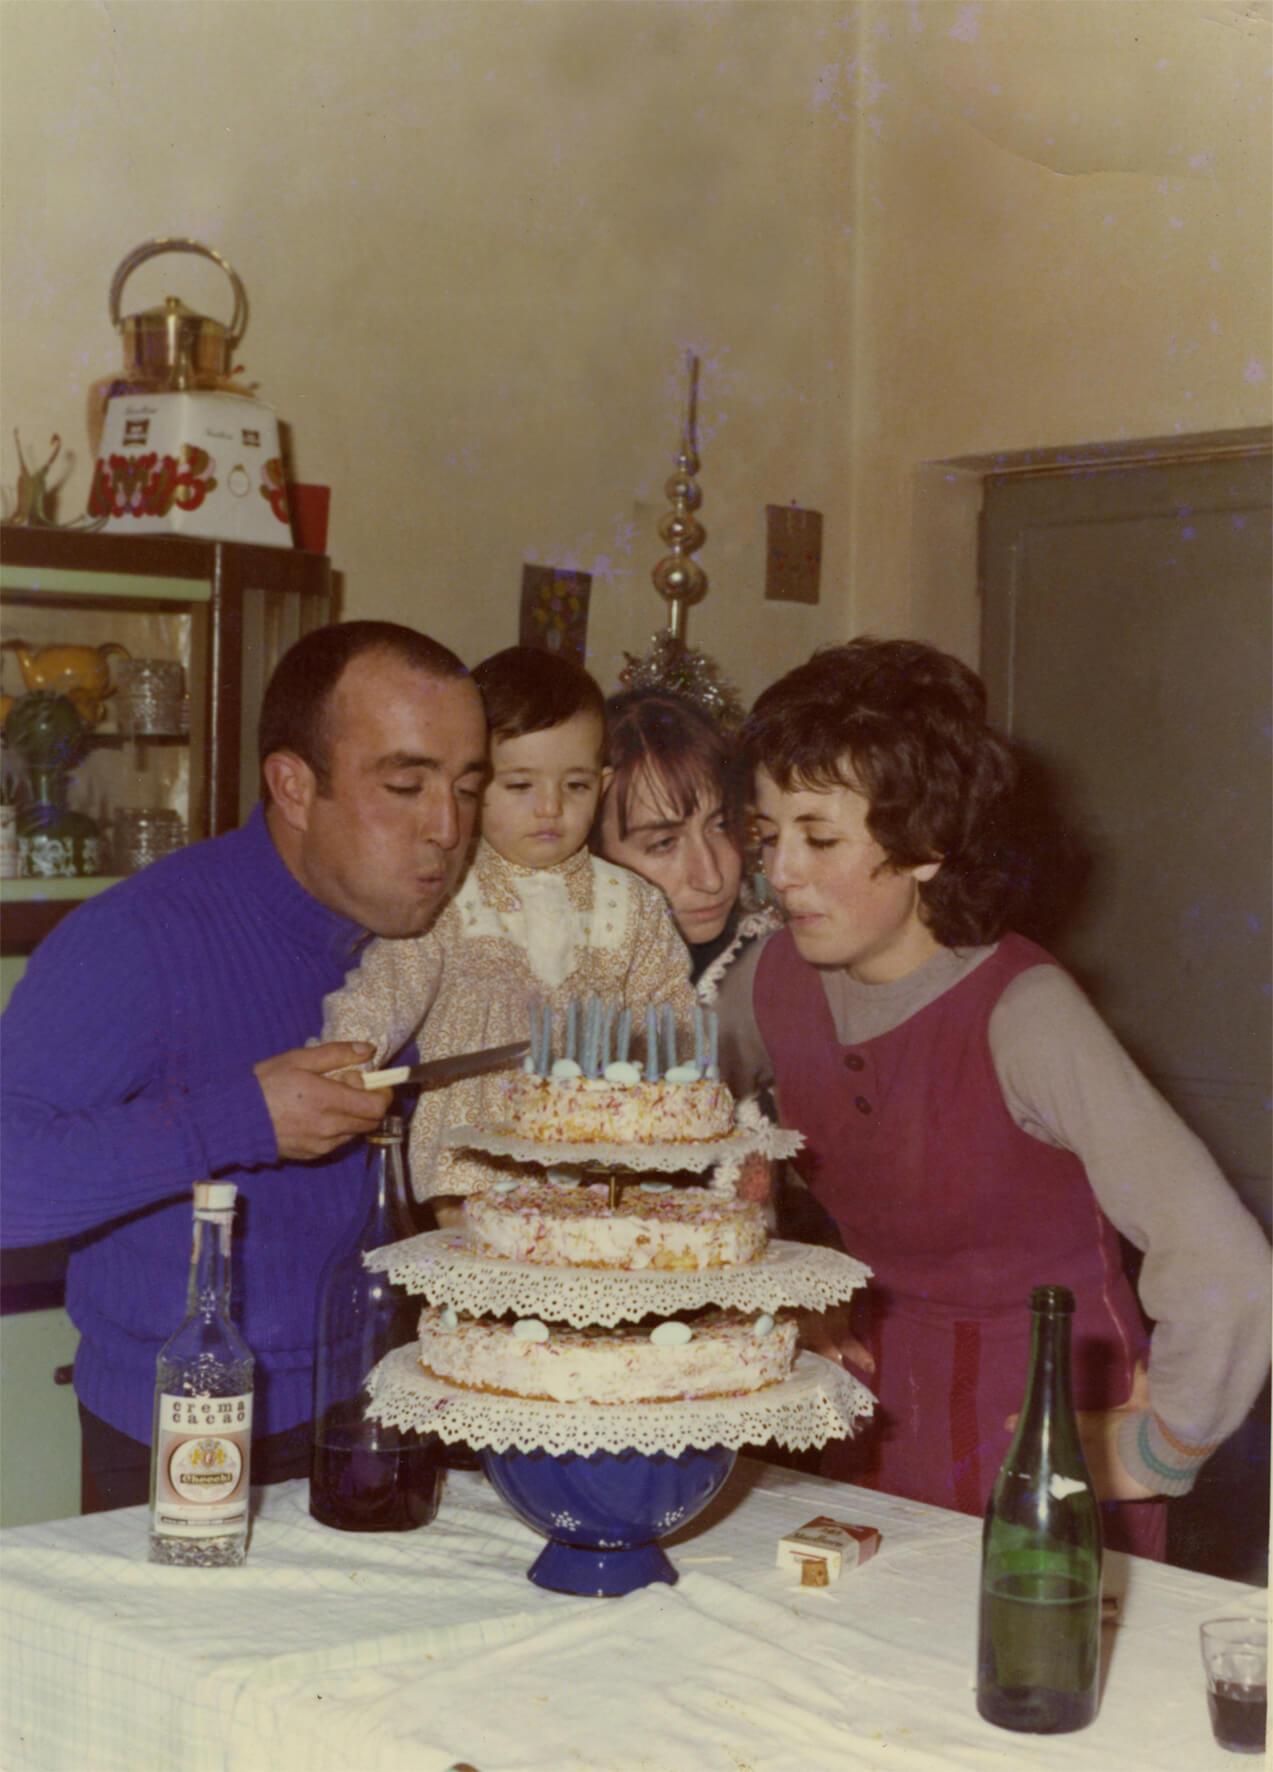 Moira Ricci, <em>20.12.53–10.08.04</em> (oncle Auro, tante Claudia et maman), 2004-2014